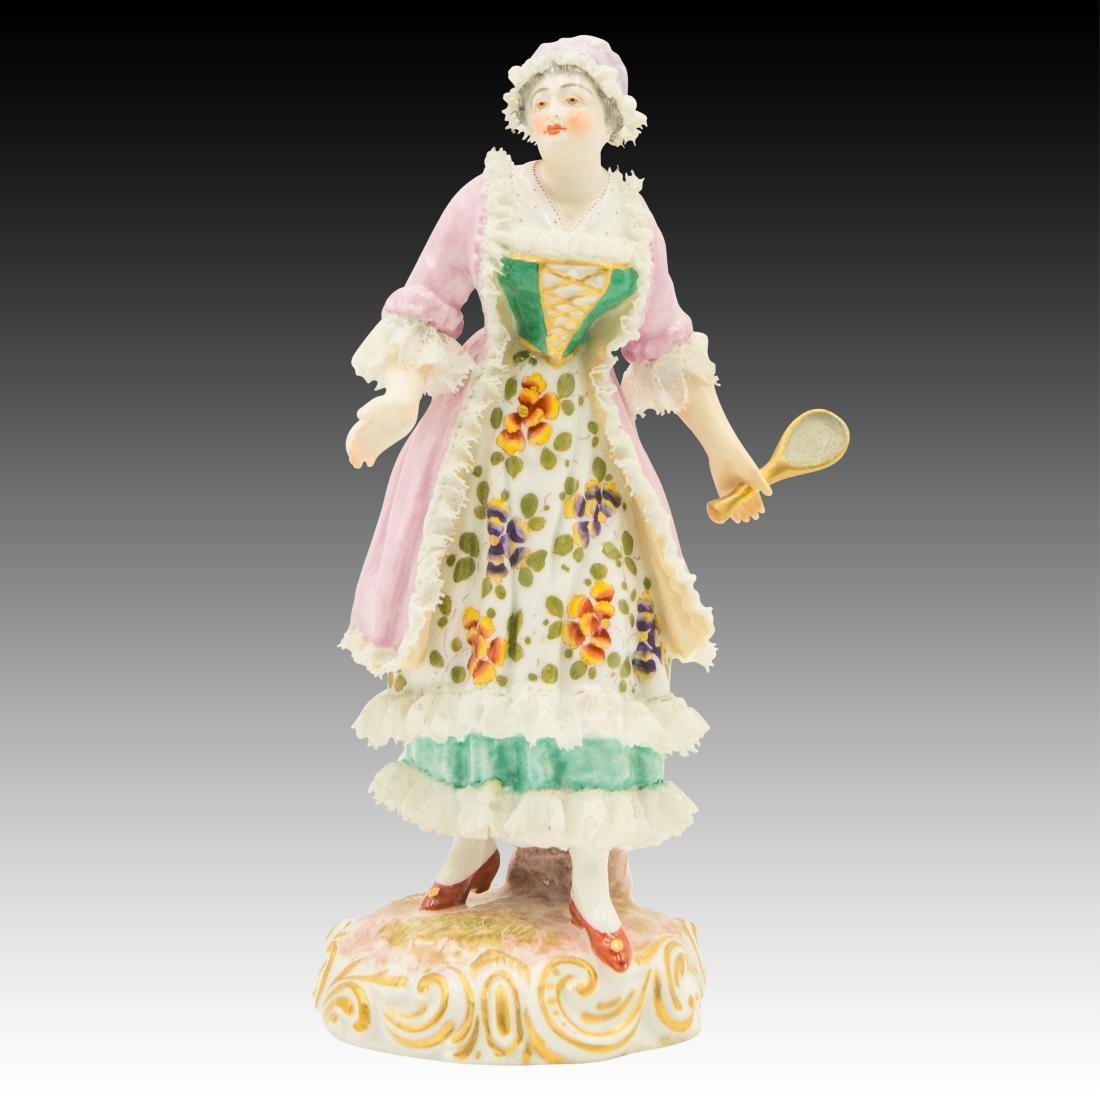 Meissen Maiden Wearing a Lace Dress Figurine